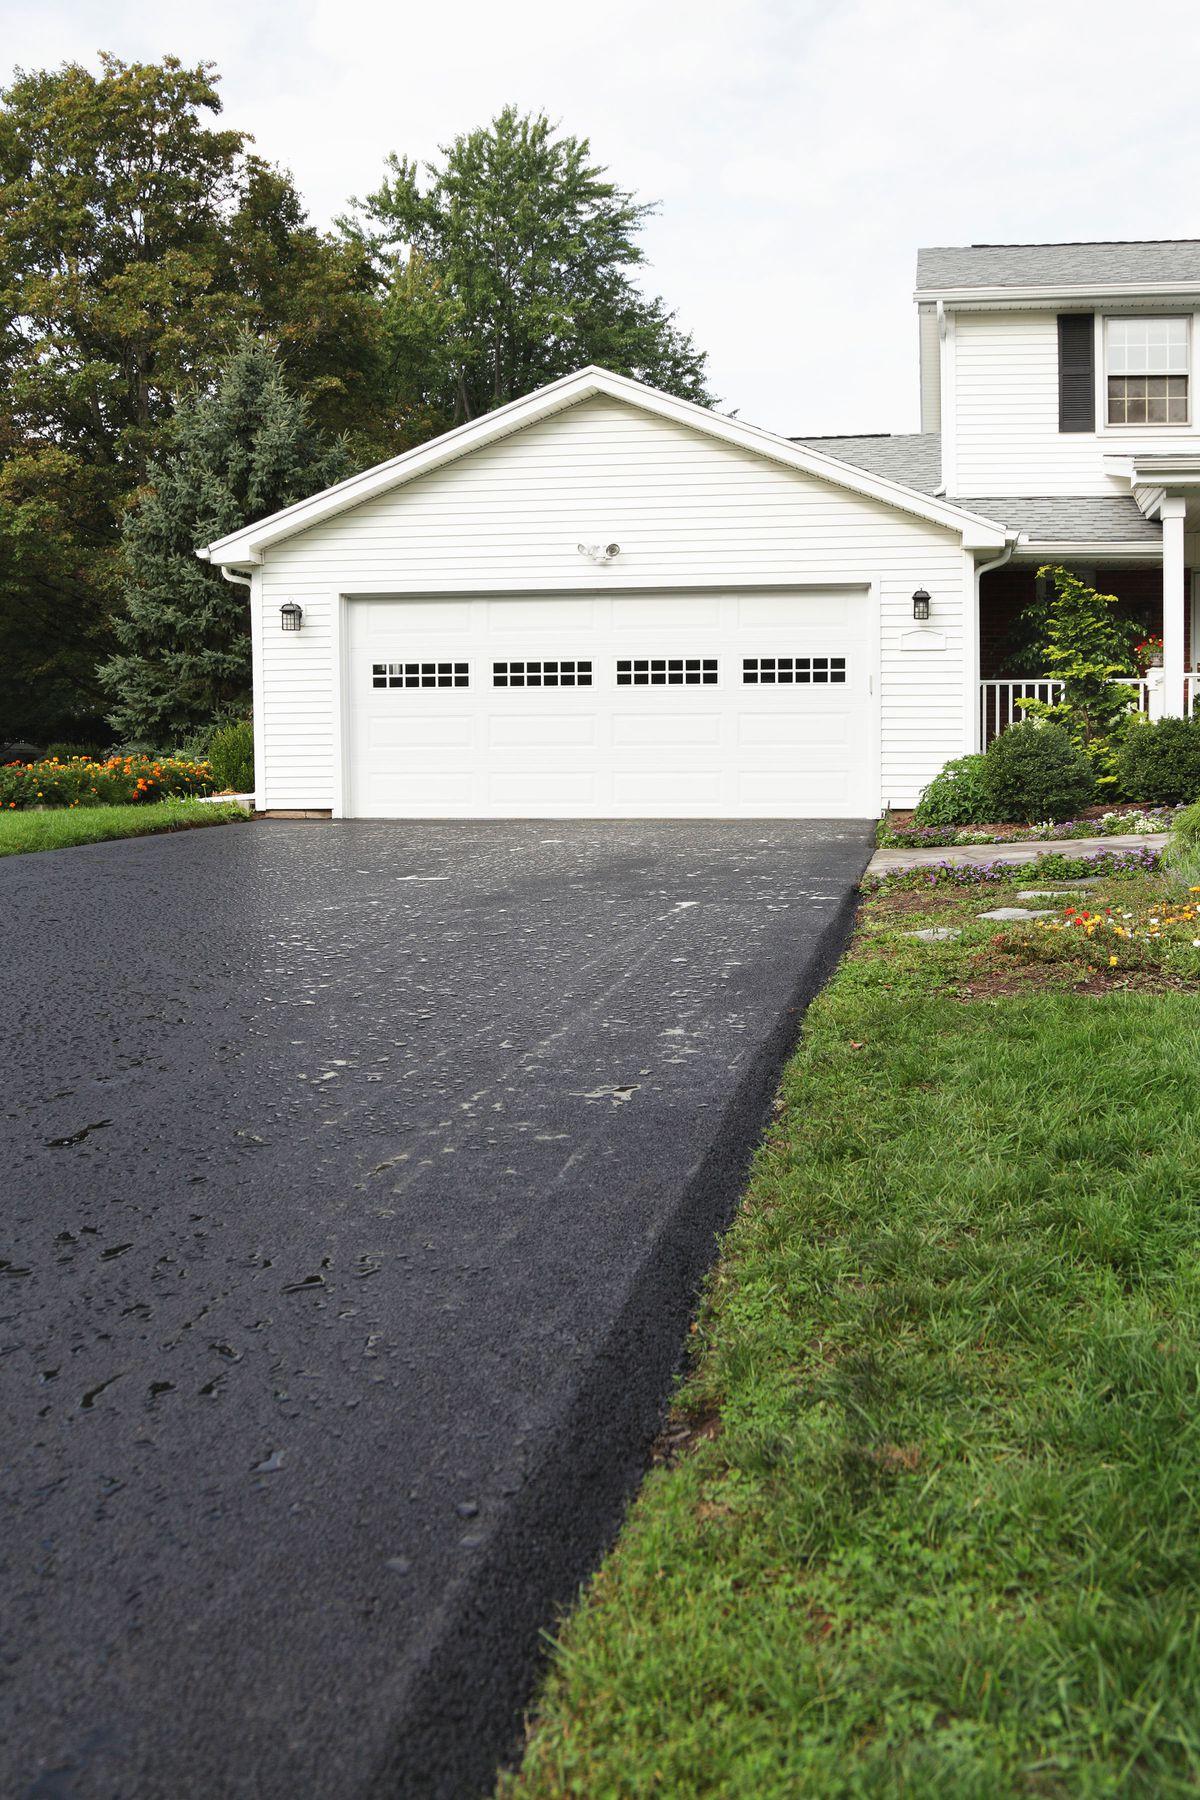 A newly installed asphalt driveway, wet with rain.